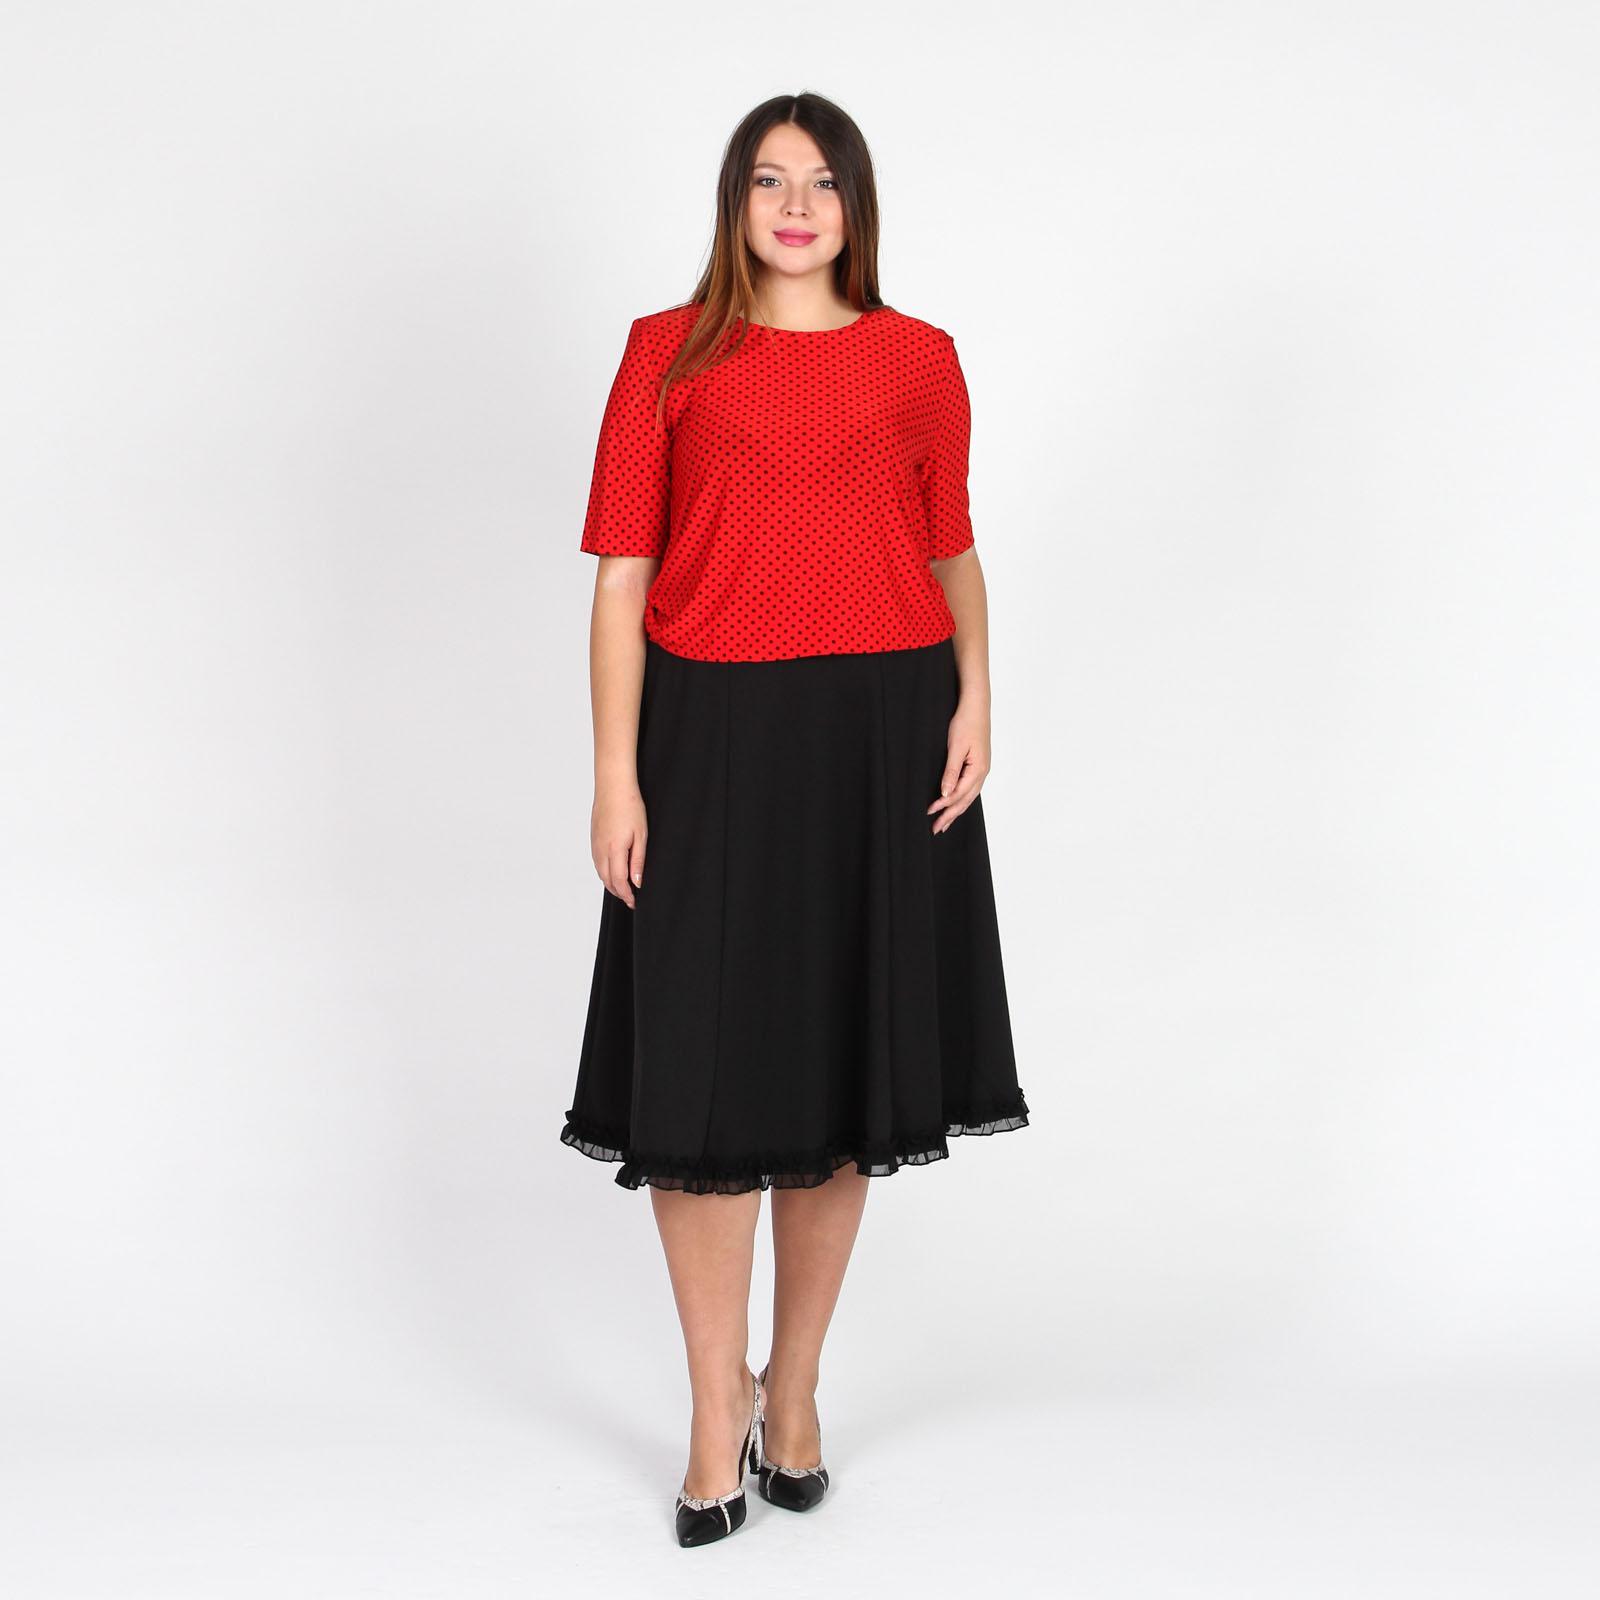 Блуза с коротким рукавом и принтом «горох»